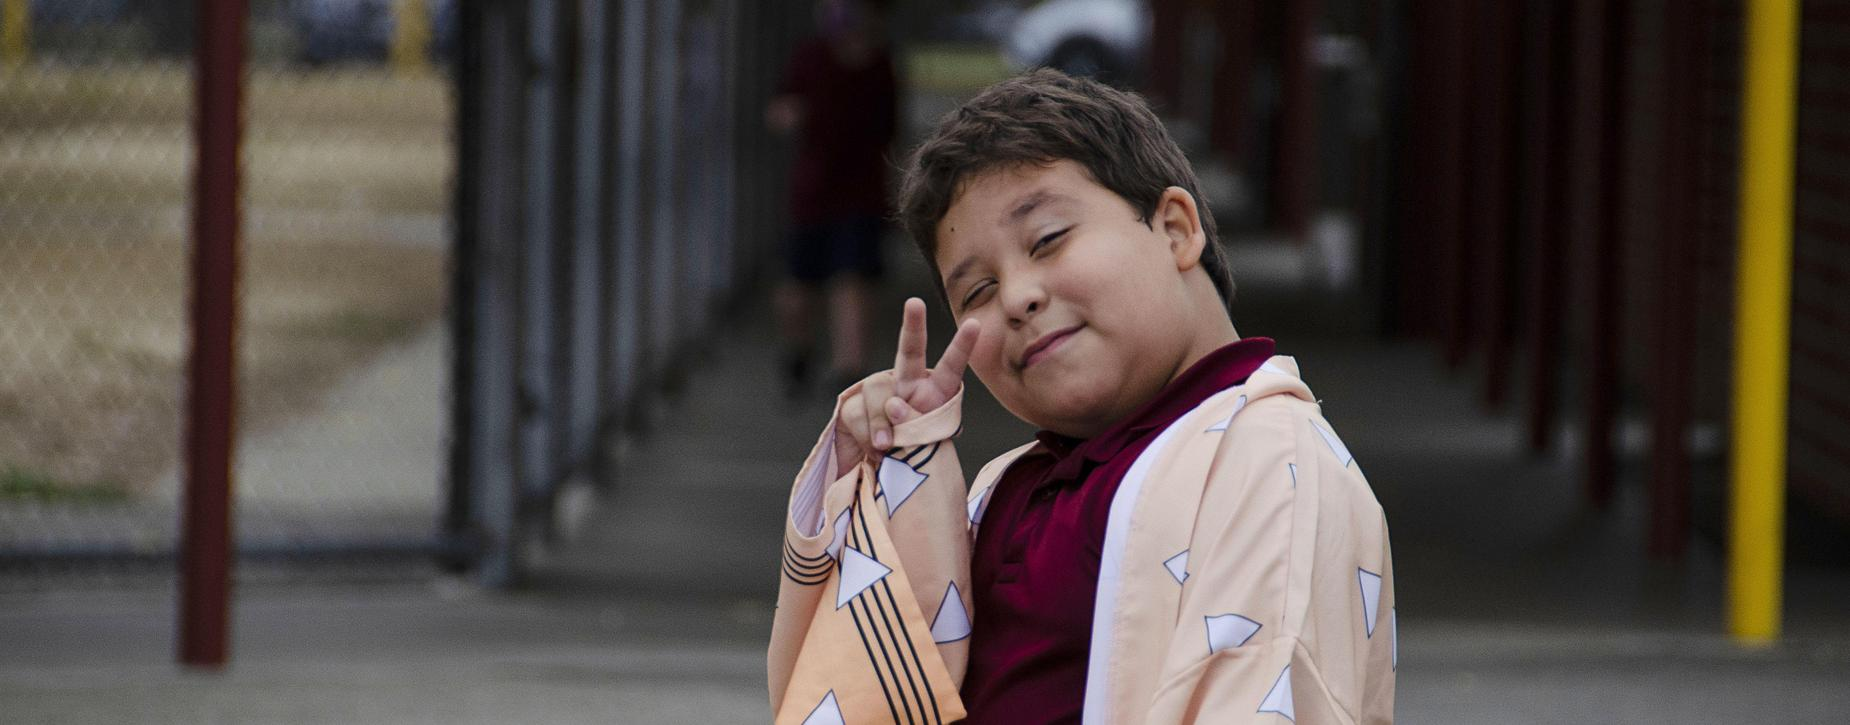 boy peace sign